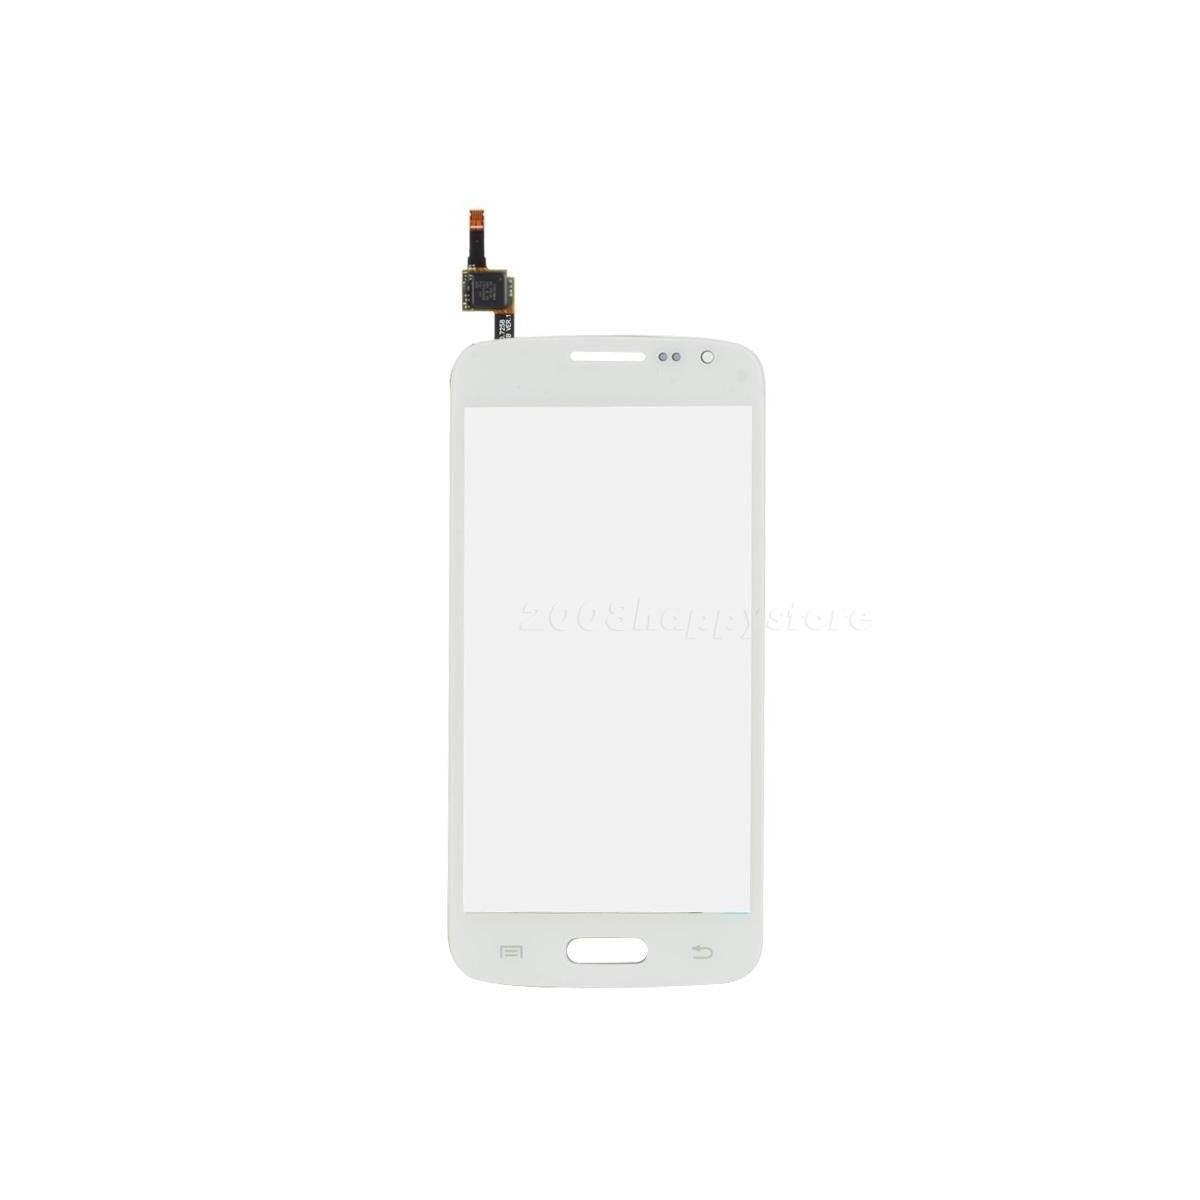 pantalla tactil digitalizador samsung galaxy express 2 g3815 blanco